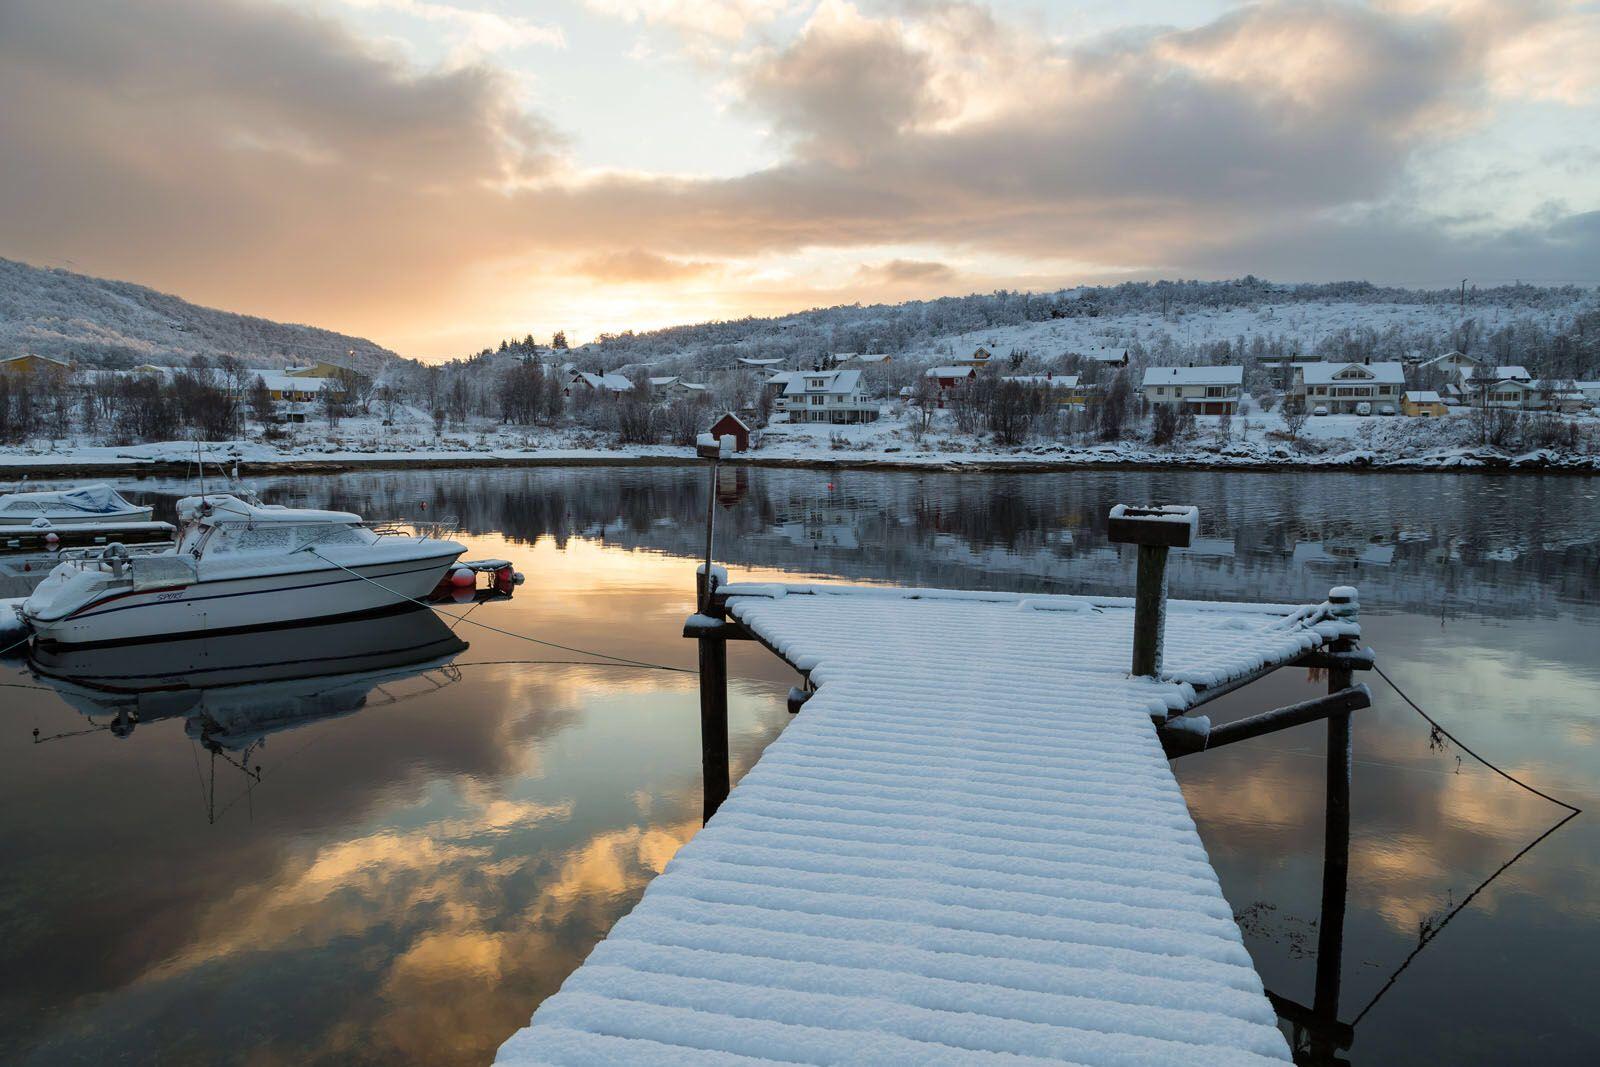 Winter Fjord, Kaldfjord, Troms, Norway